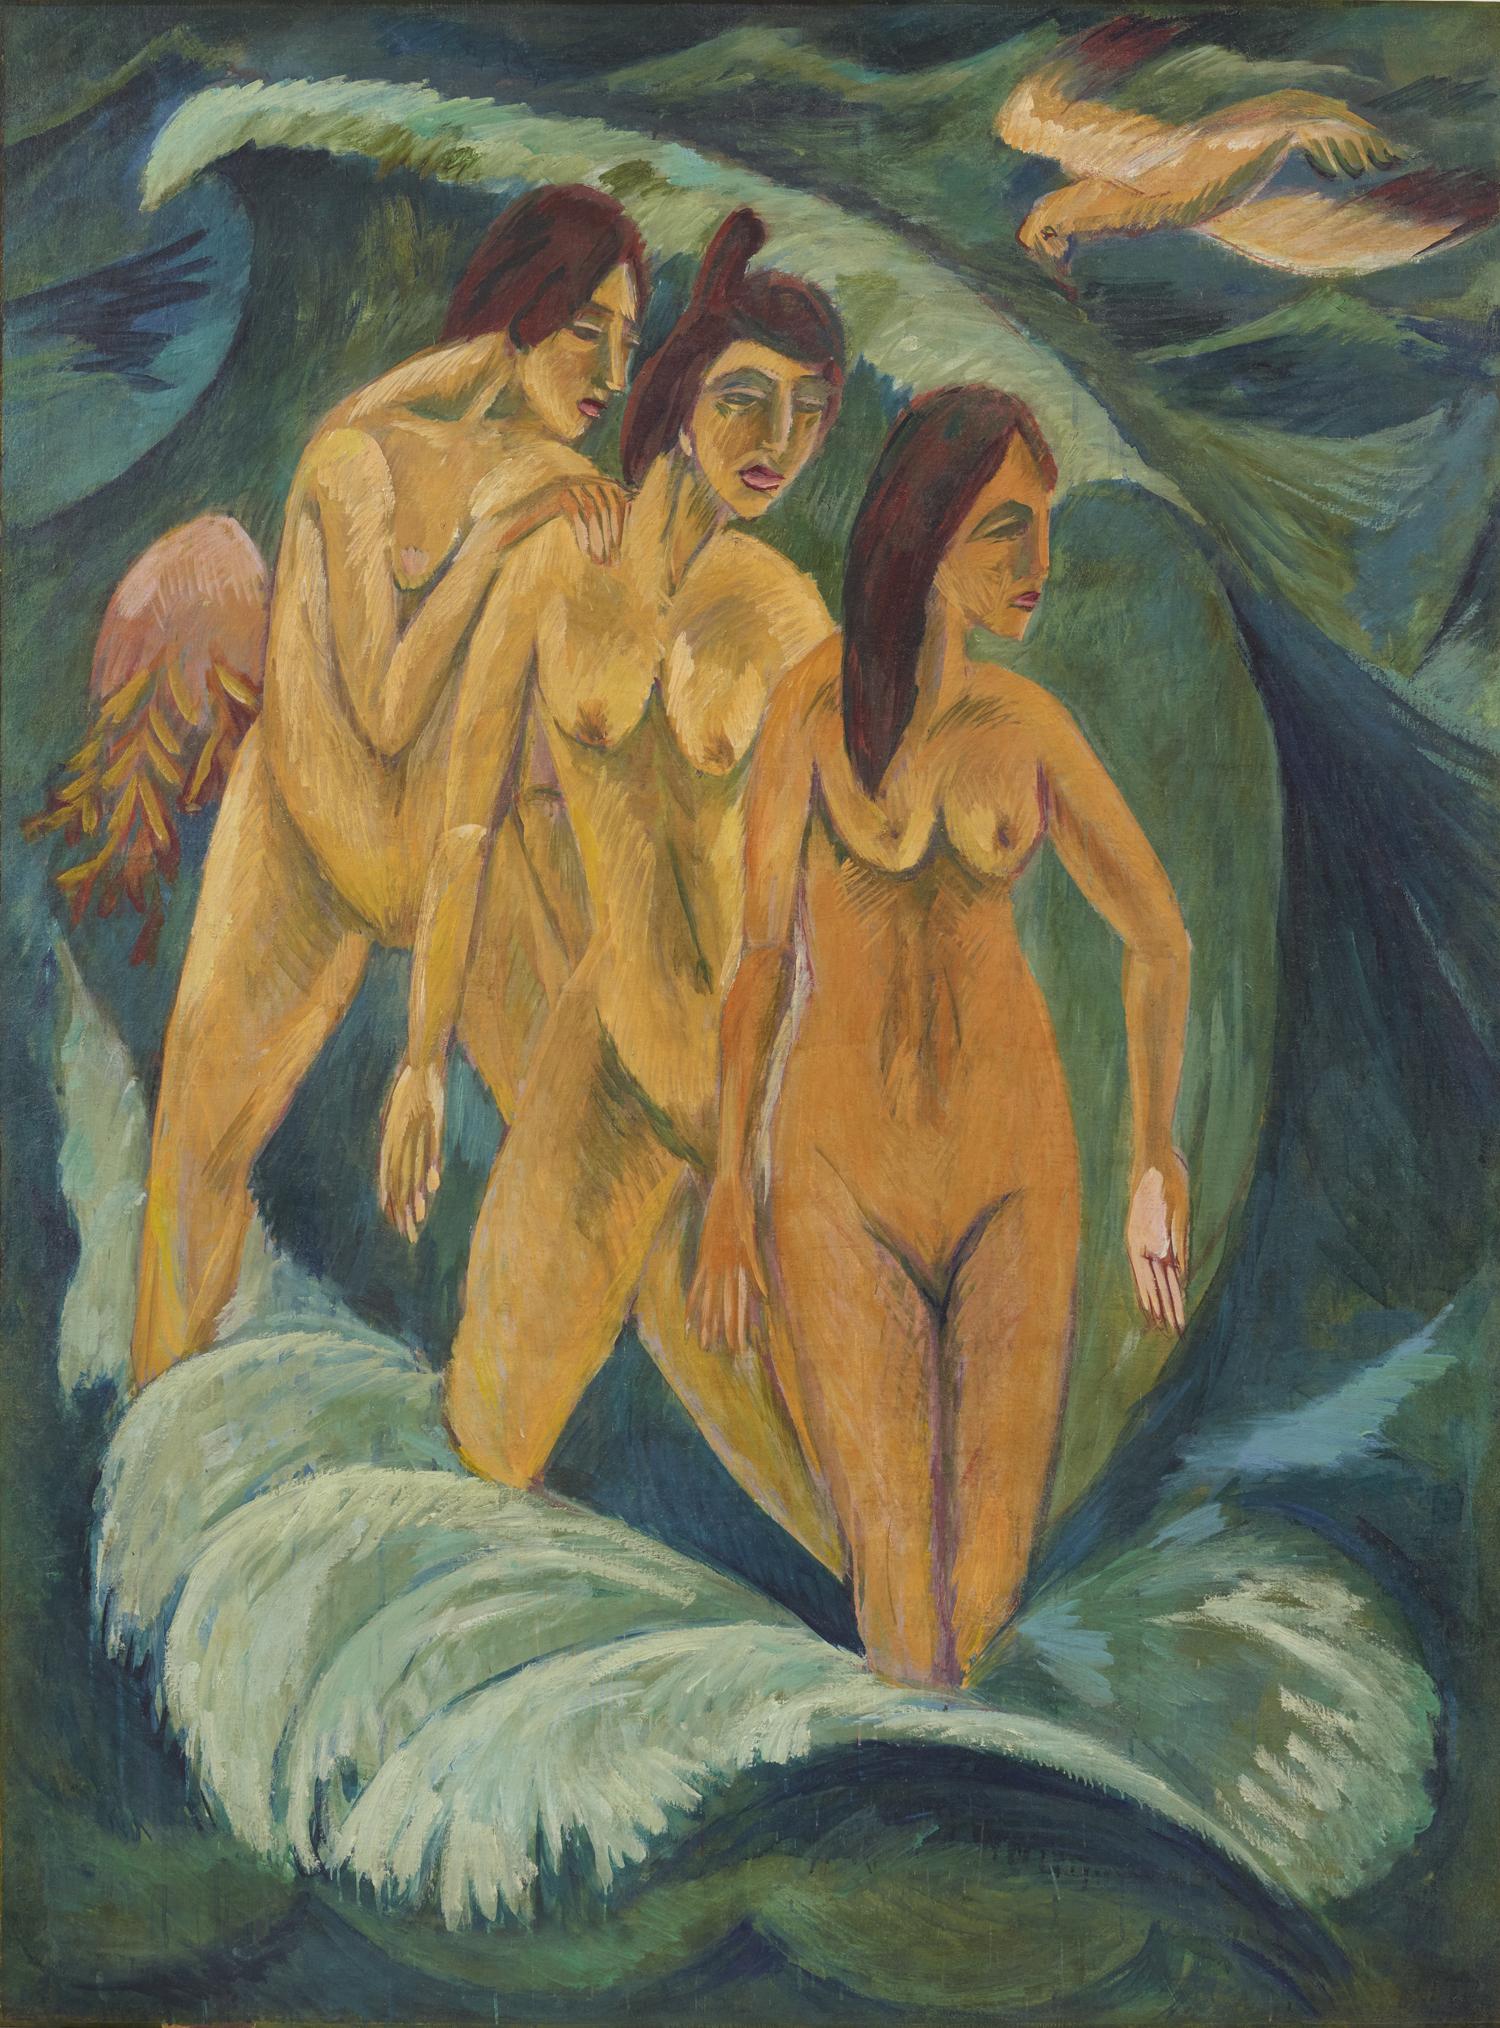 Ernst Ludwig Kirchner, Drei Badende